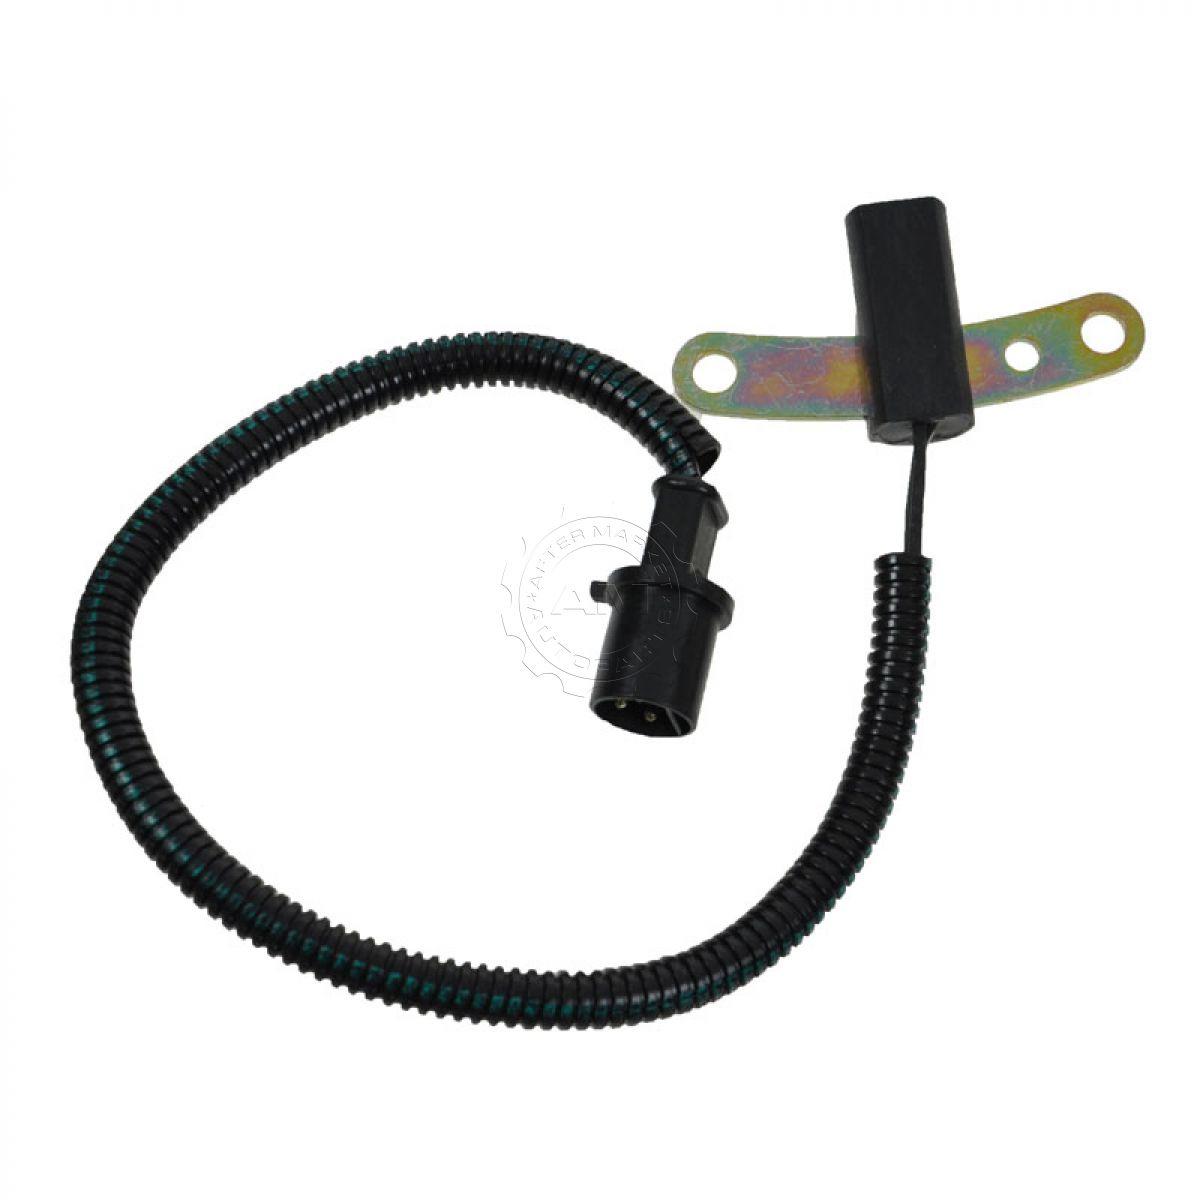 Crankshaft Position Angle Sensor Cps Cas For 91 92 Jeep Wrangler Crank Cherokee